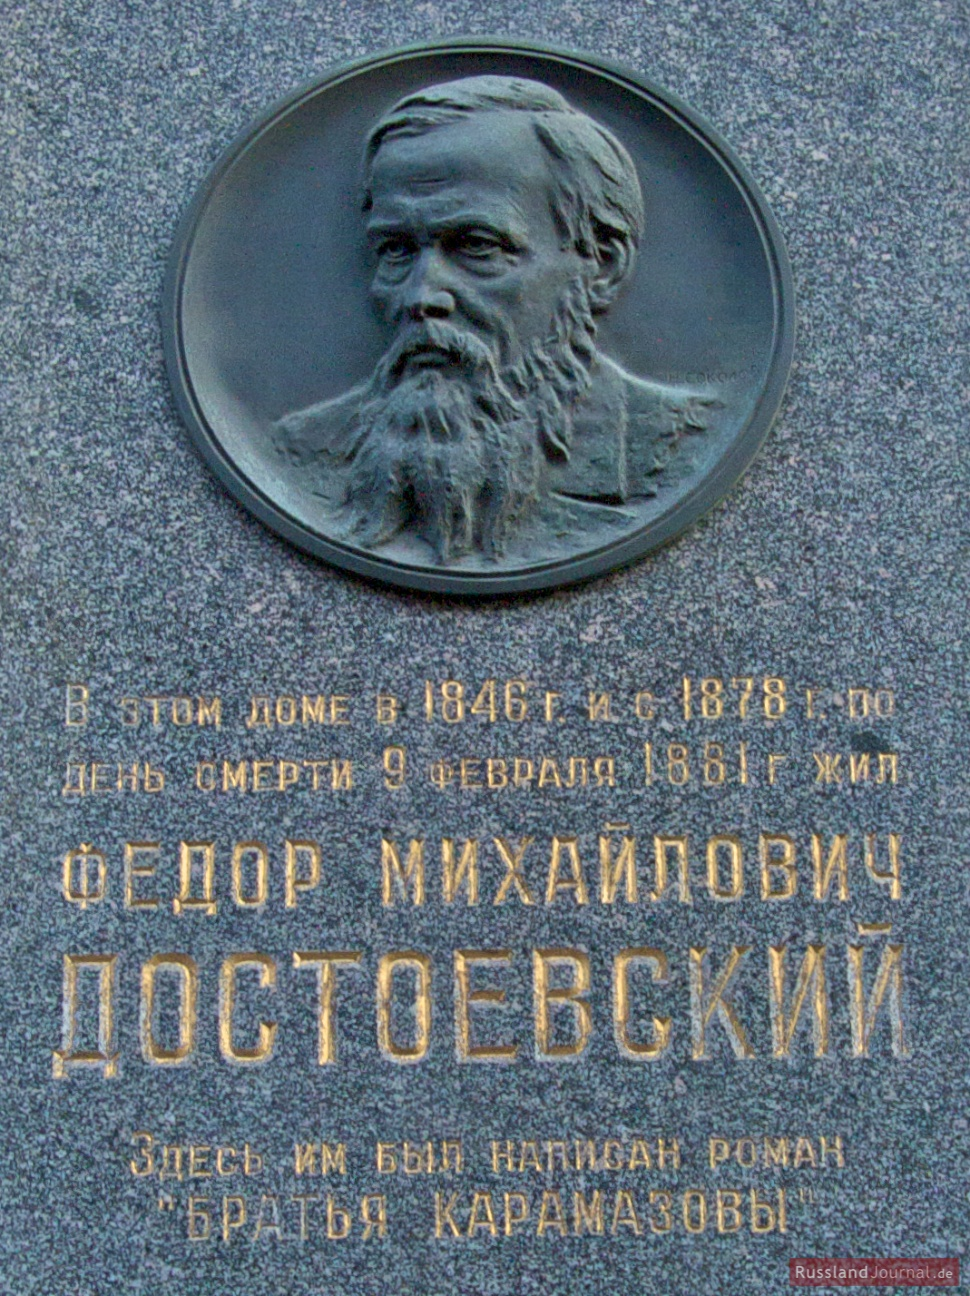 Dostojewski Gedenktafel